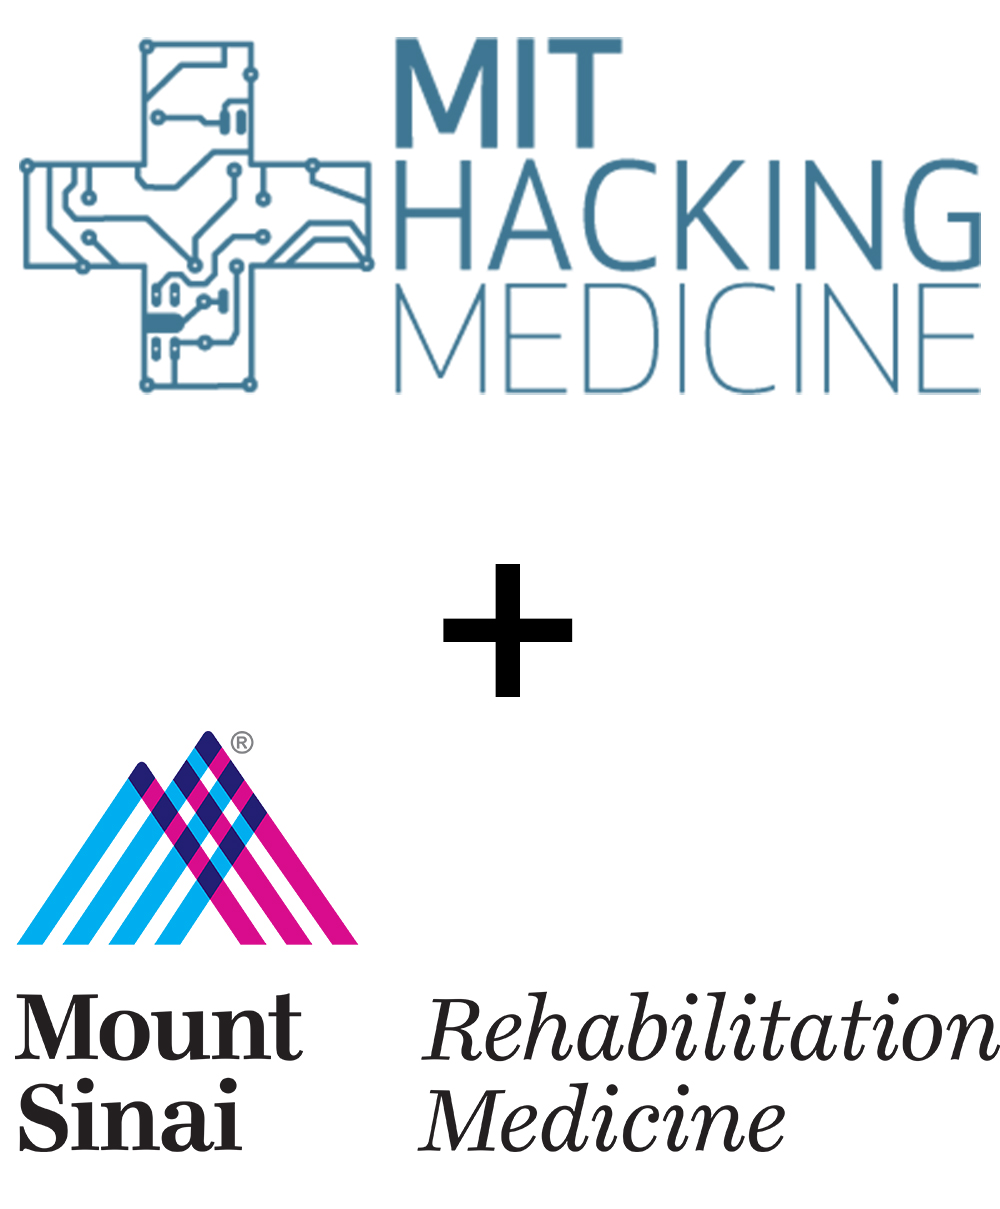 Hacking_Medicine_v3.jpg